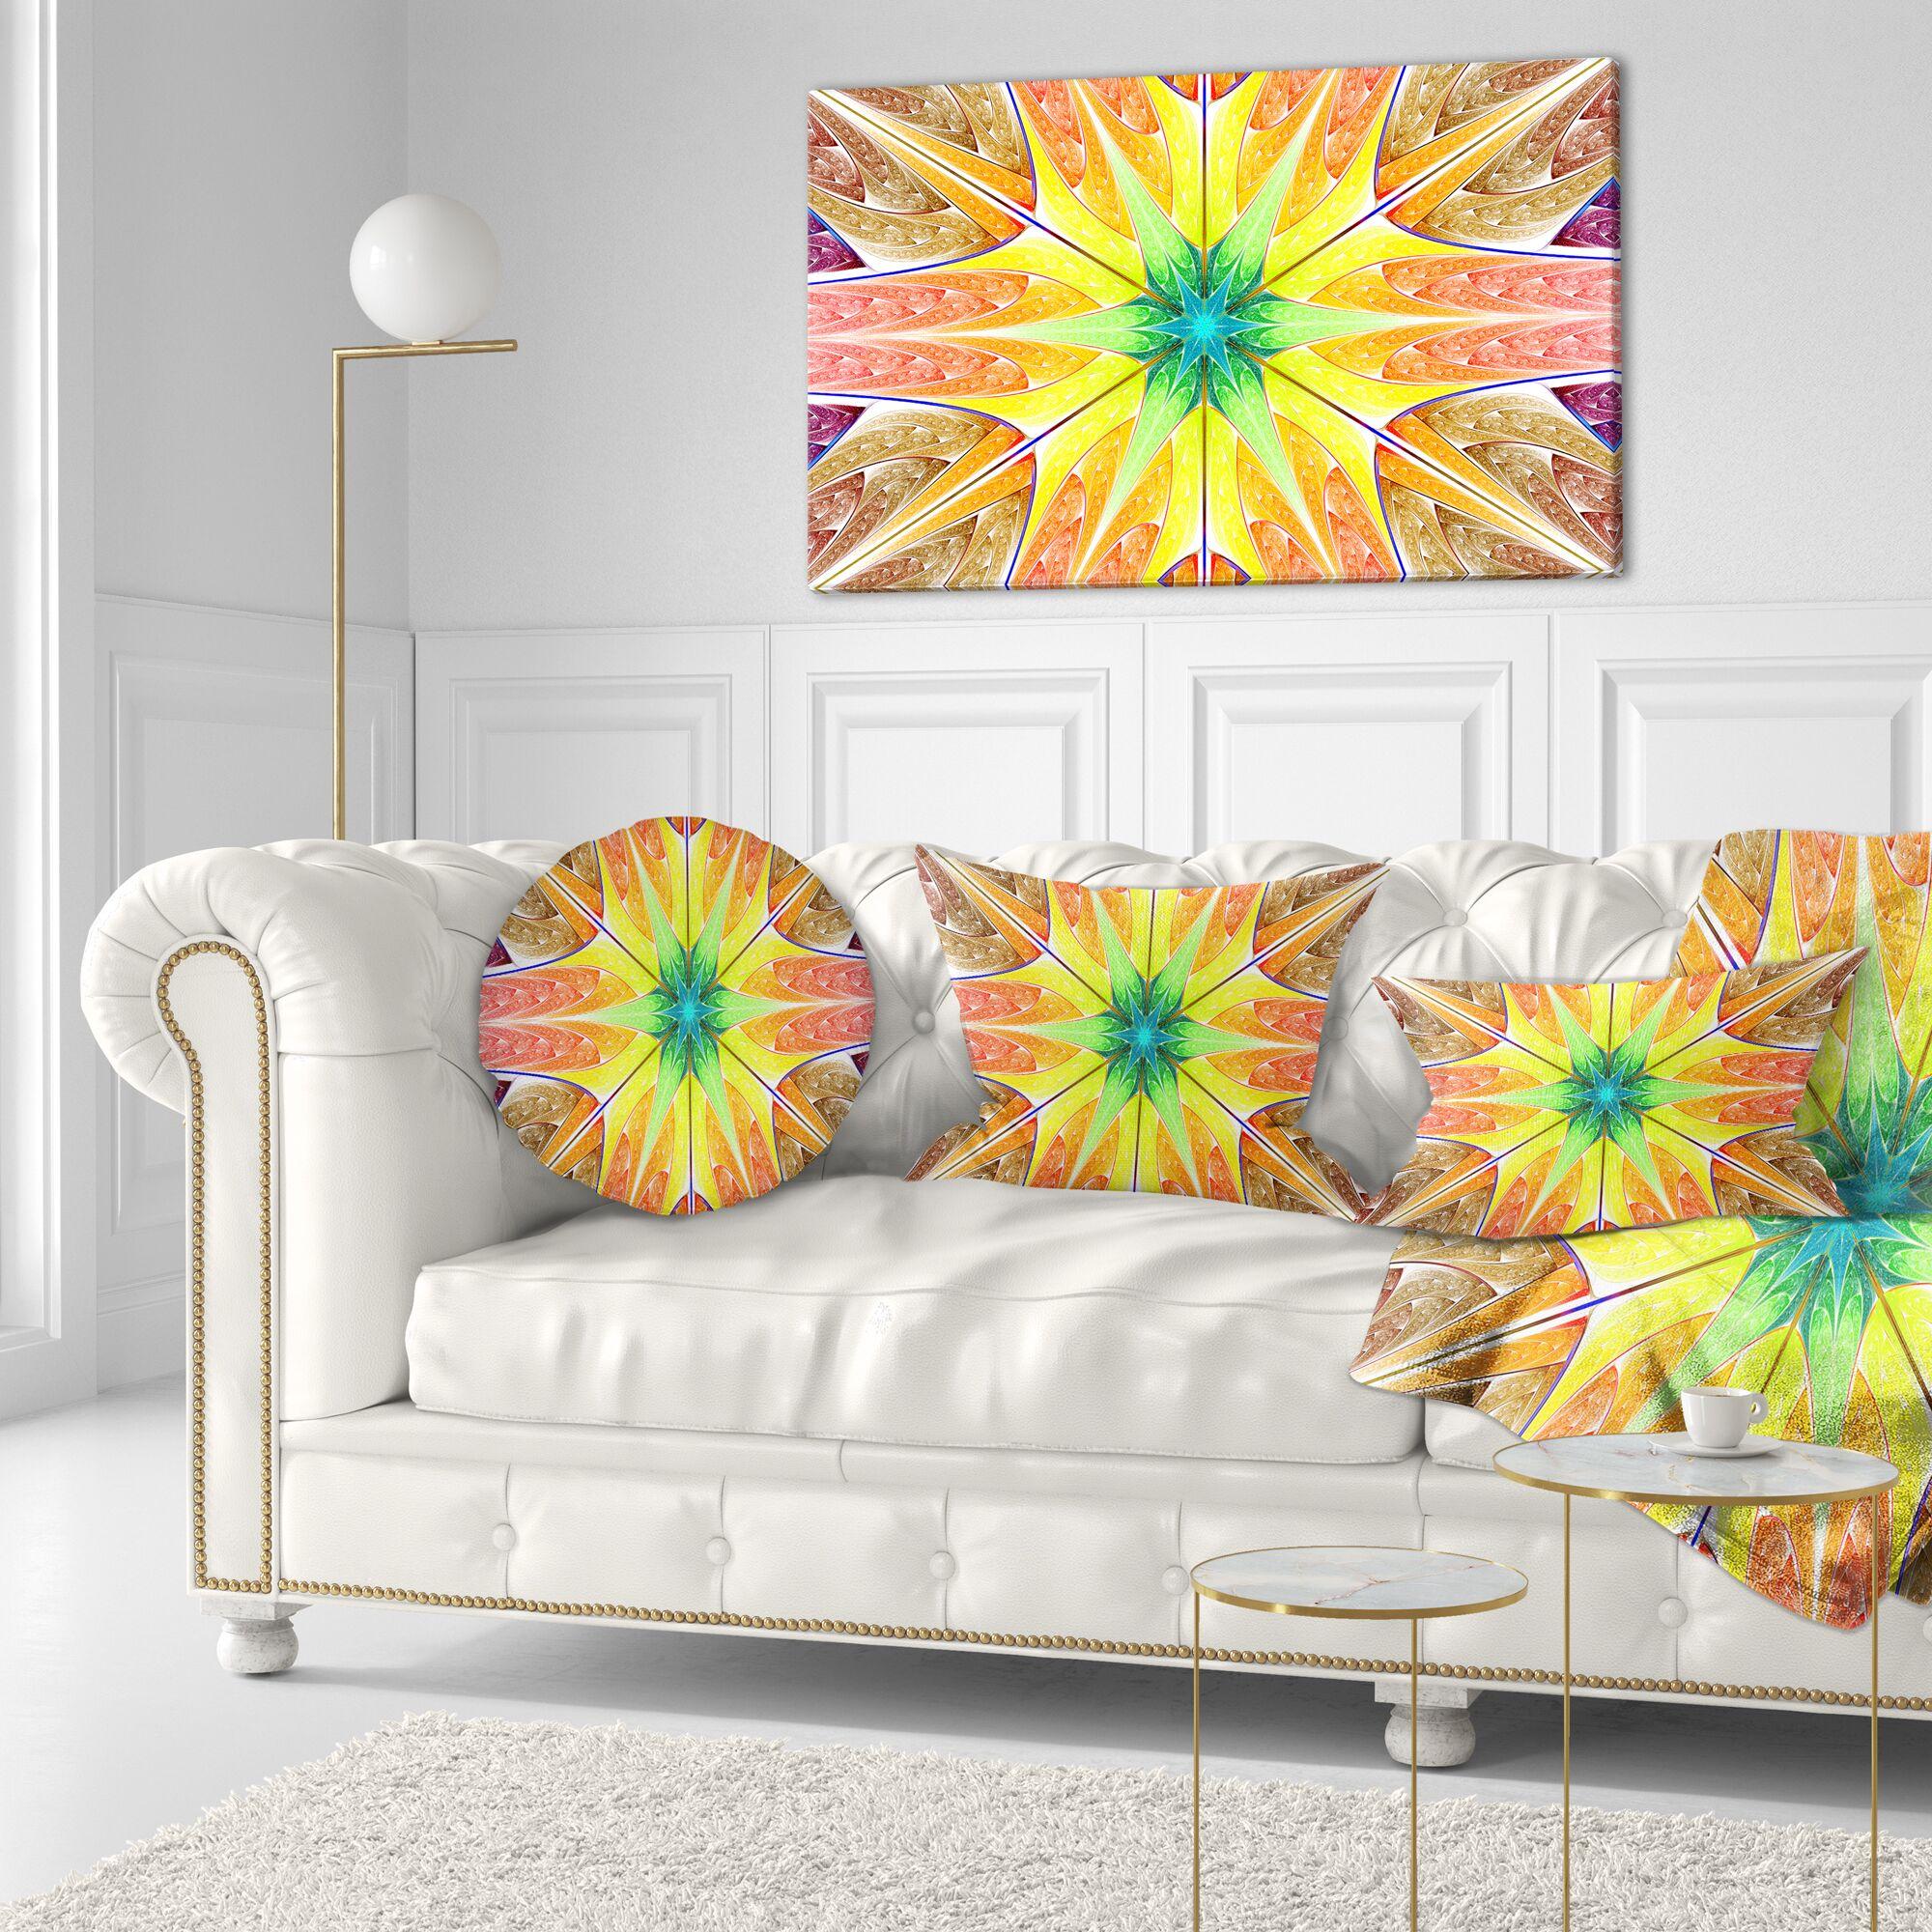 Abstract Glowing Fractal Texture Lumbar Pillow